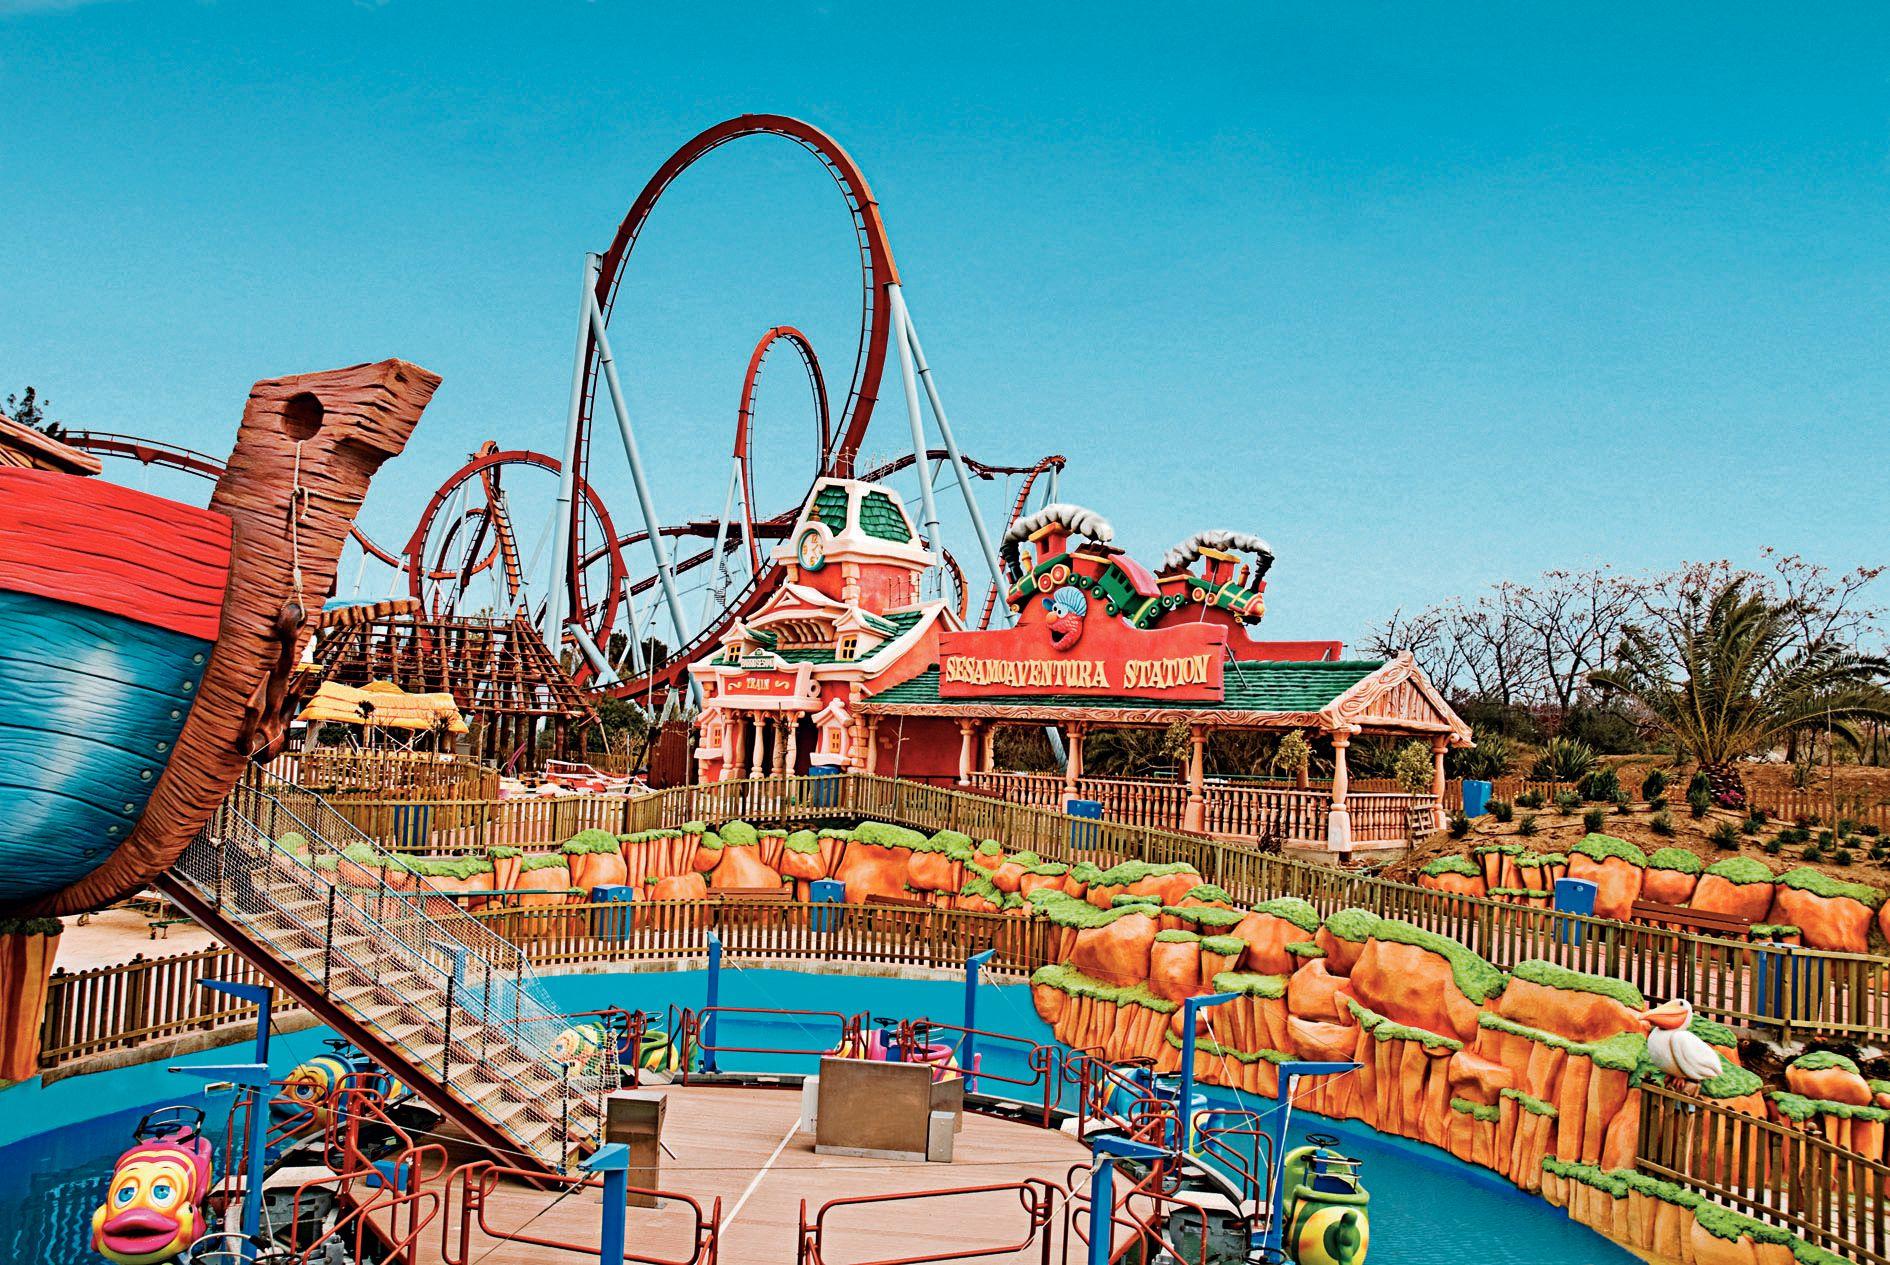 Portaventura Theme Park Near Salou In Spain Httpwwwmytravel - Port aventura billet